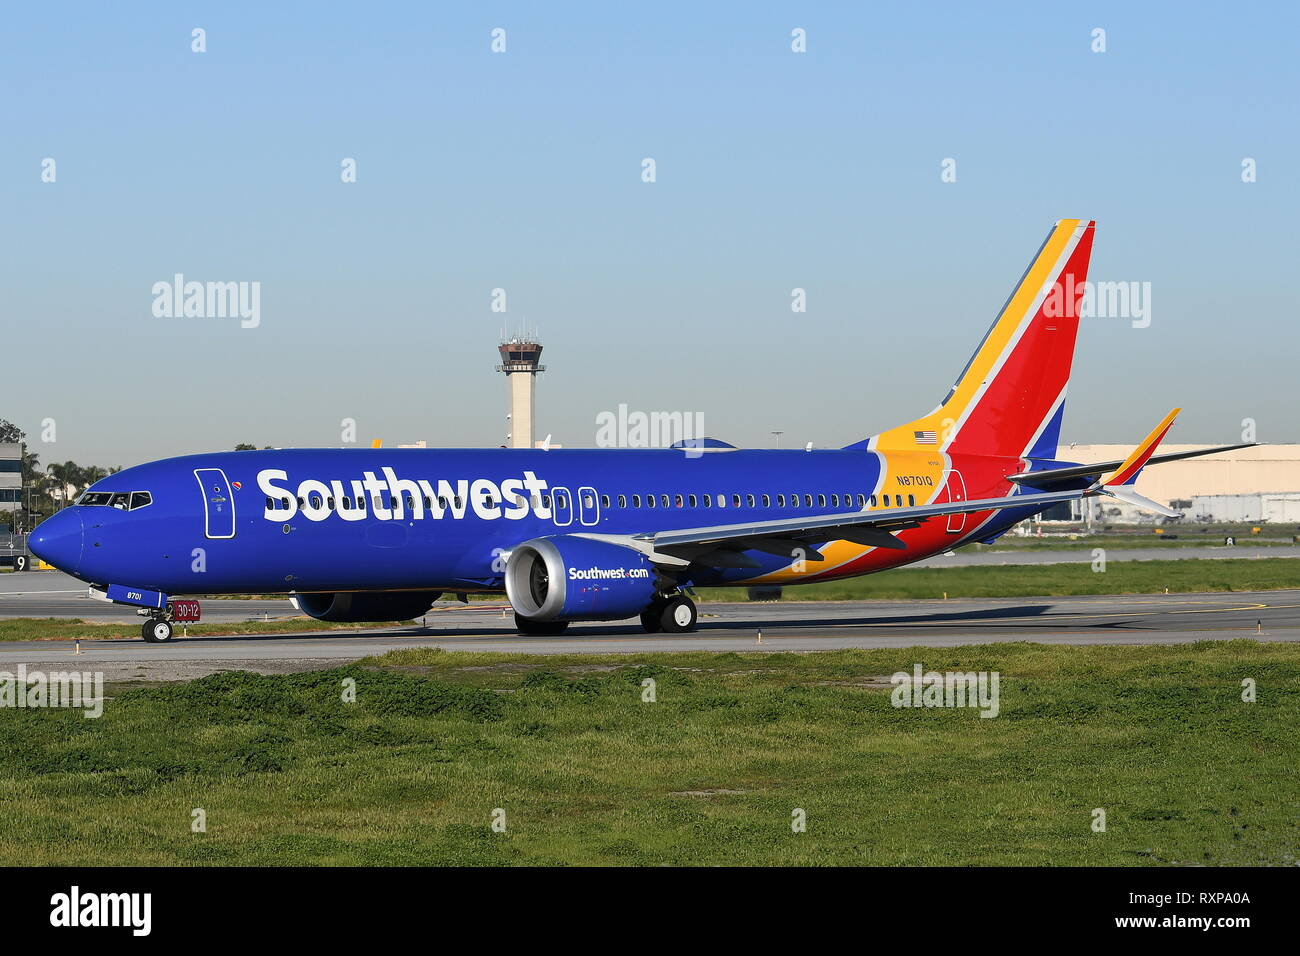 Boeing 737 Winglet Stock Photos & Boeing 737 Winglet Stock